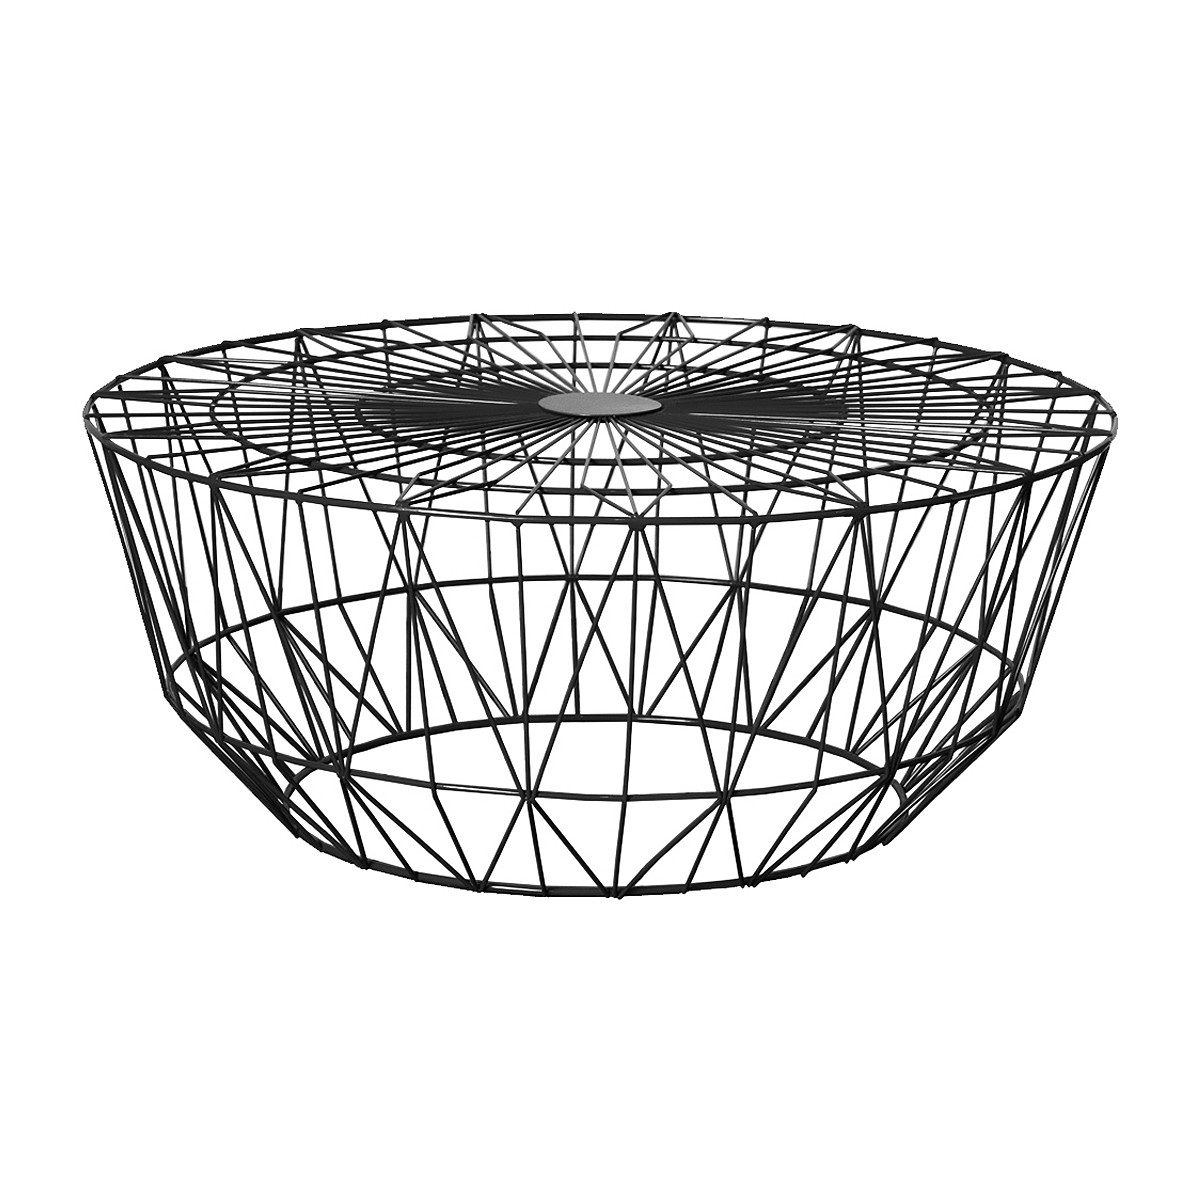 Life Interiors - Studio Wire Coffee Table (Black, 90Cm) - Modern regarding Black Wire Coffee Tables (Image 12 of 30)